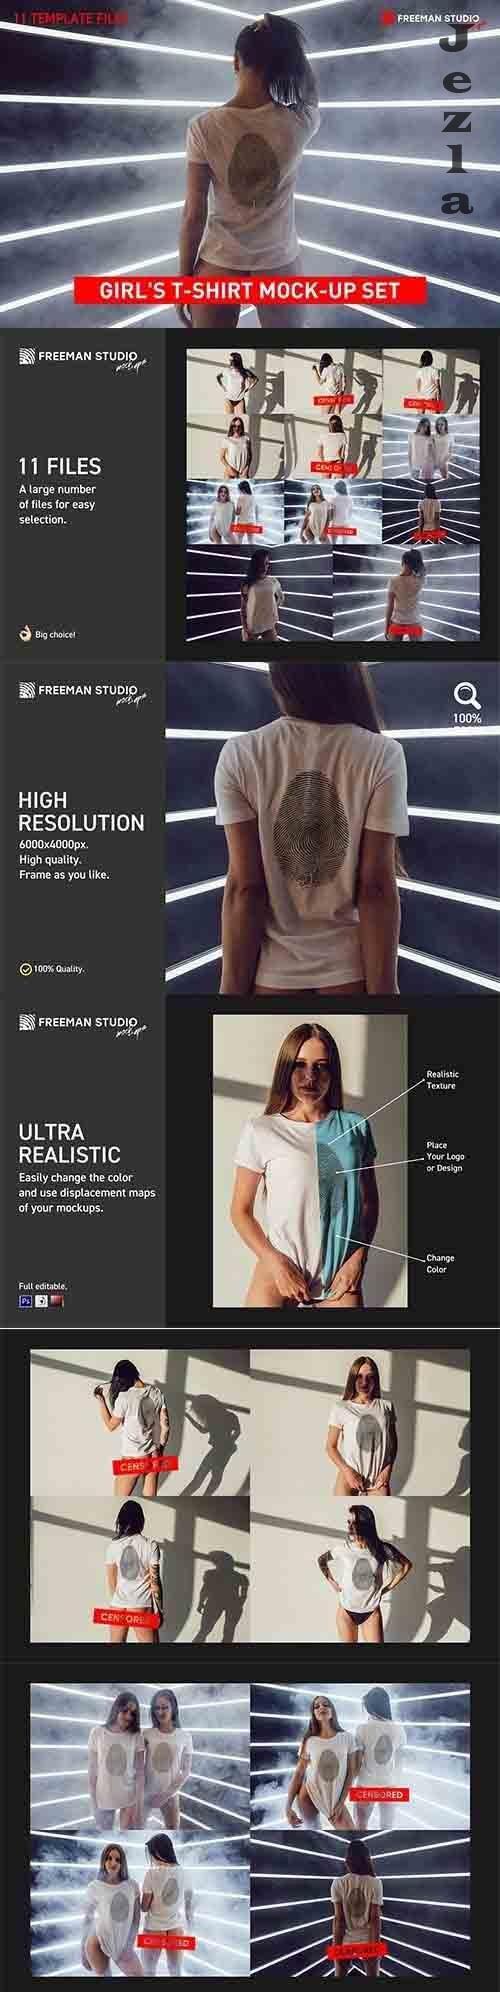 Girl's T-Shirt Mock-Up Set - 5997137